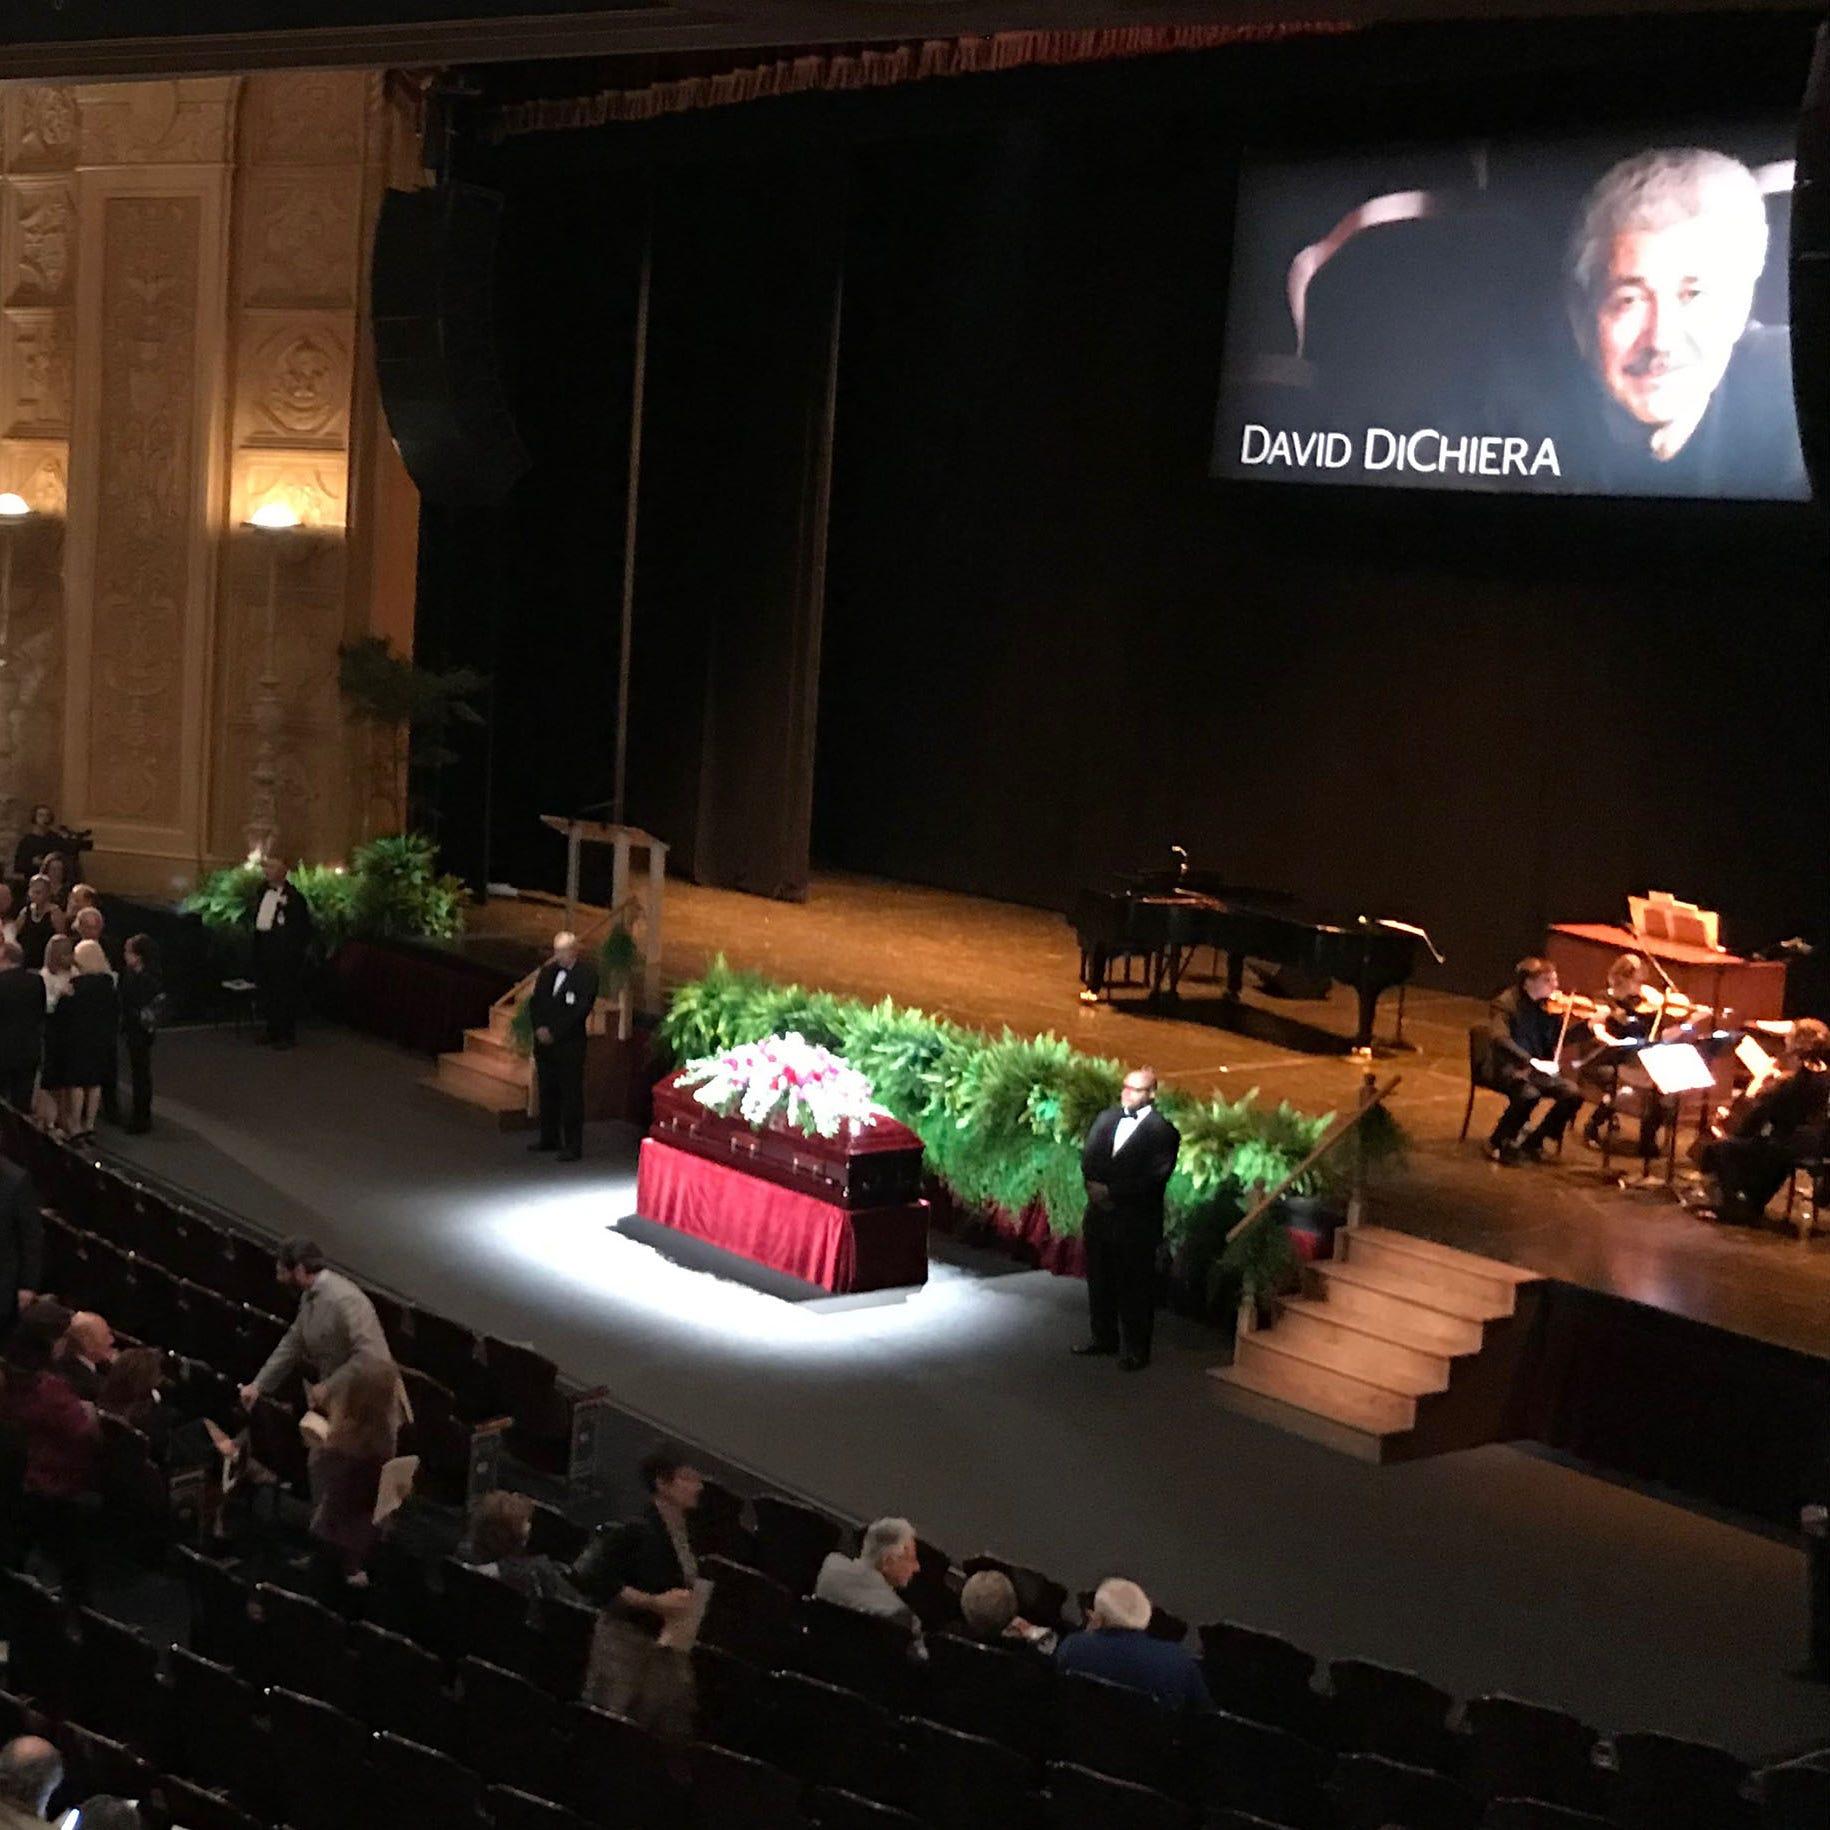 Emotional funeral for opera founder David DiChiera: 'He was inspiring'